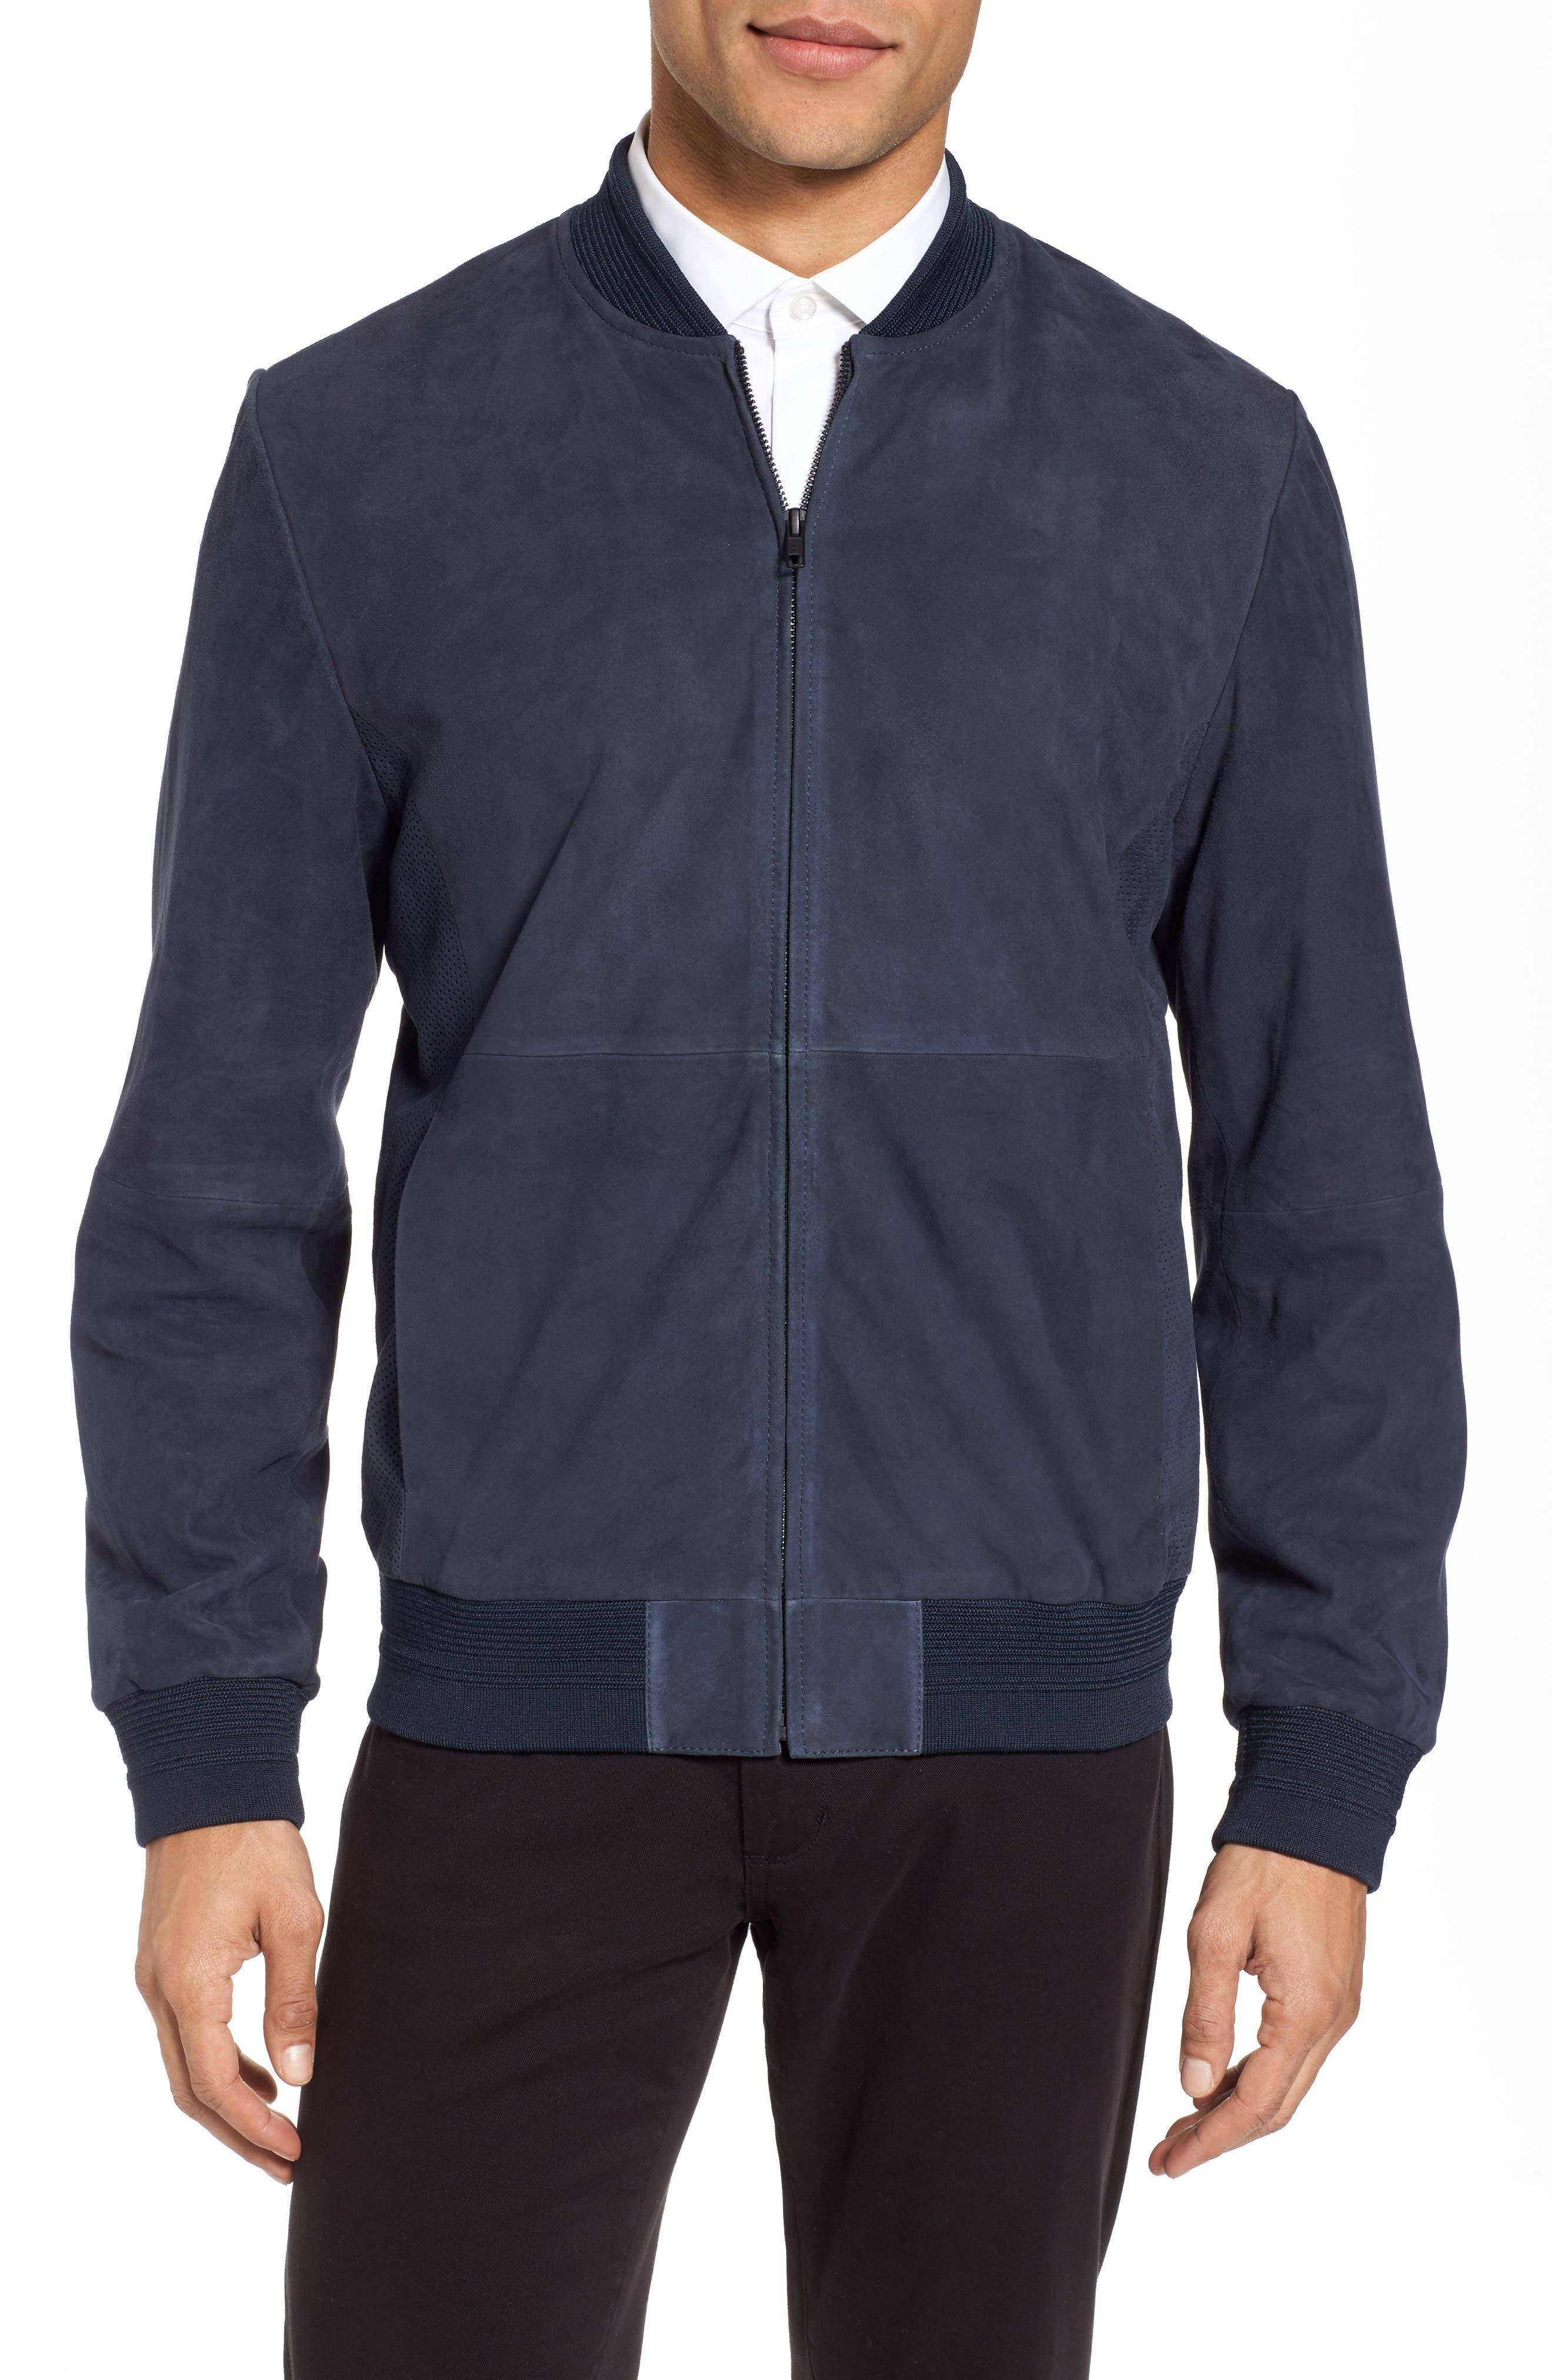 Suede Bomber Jacket,                         Main,                         color, Navy Blue